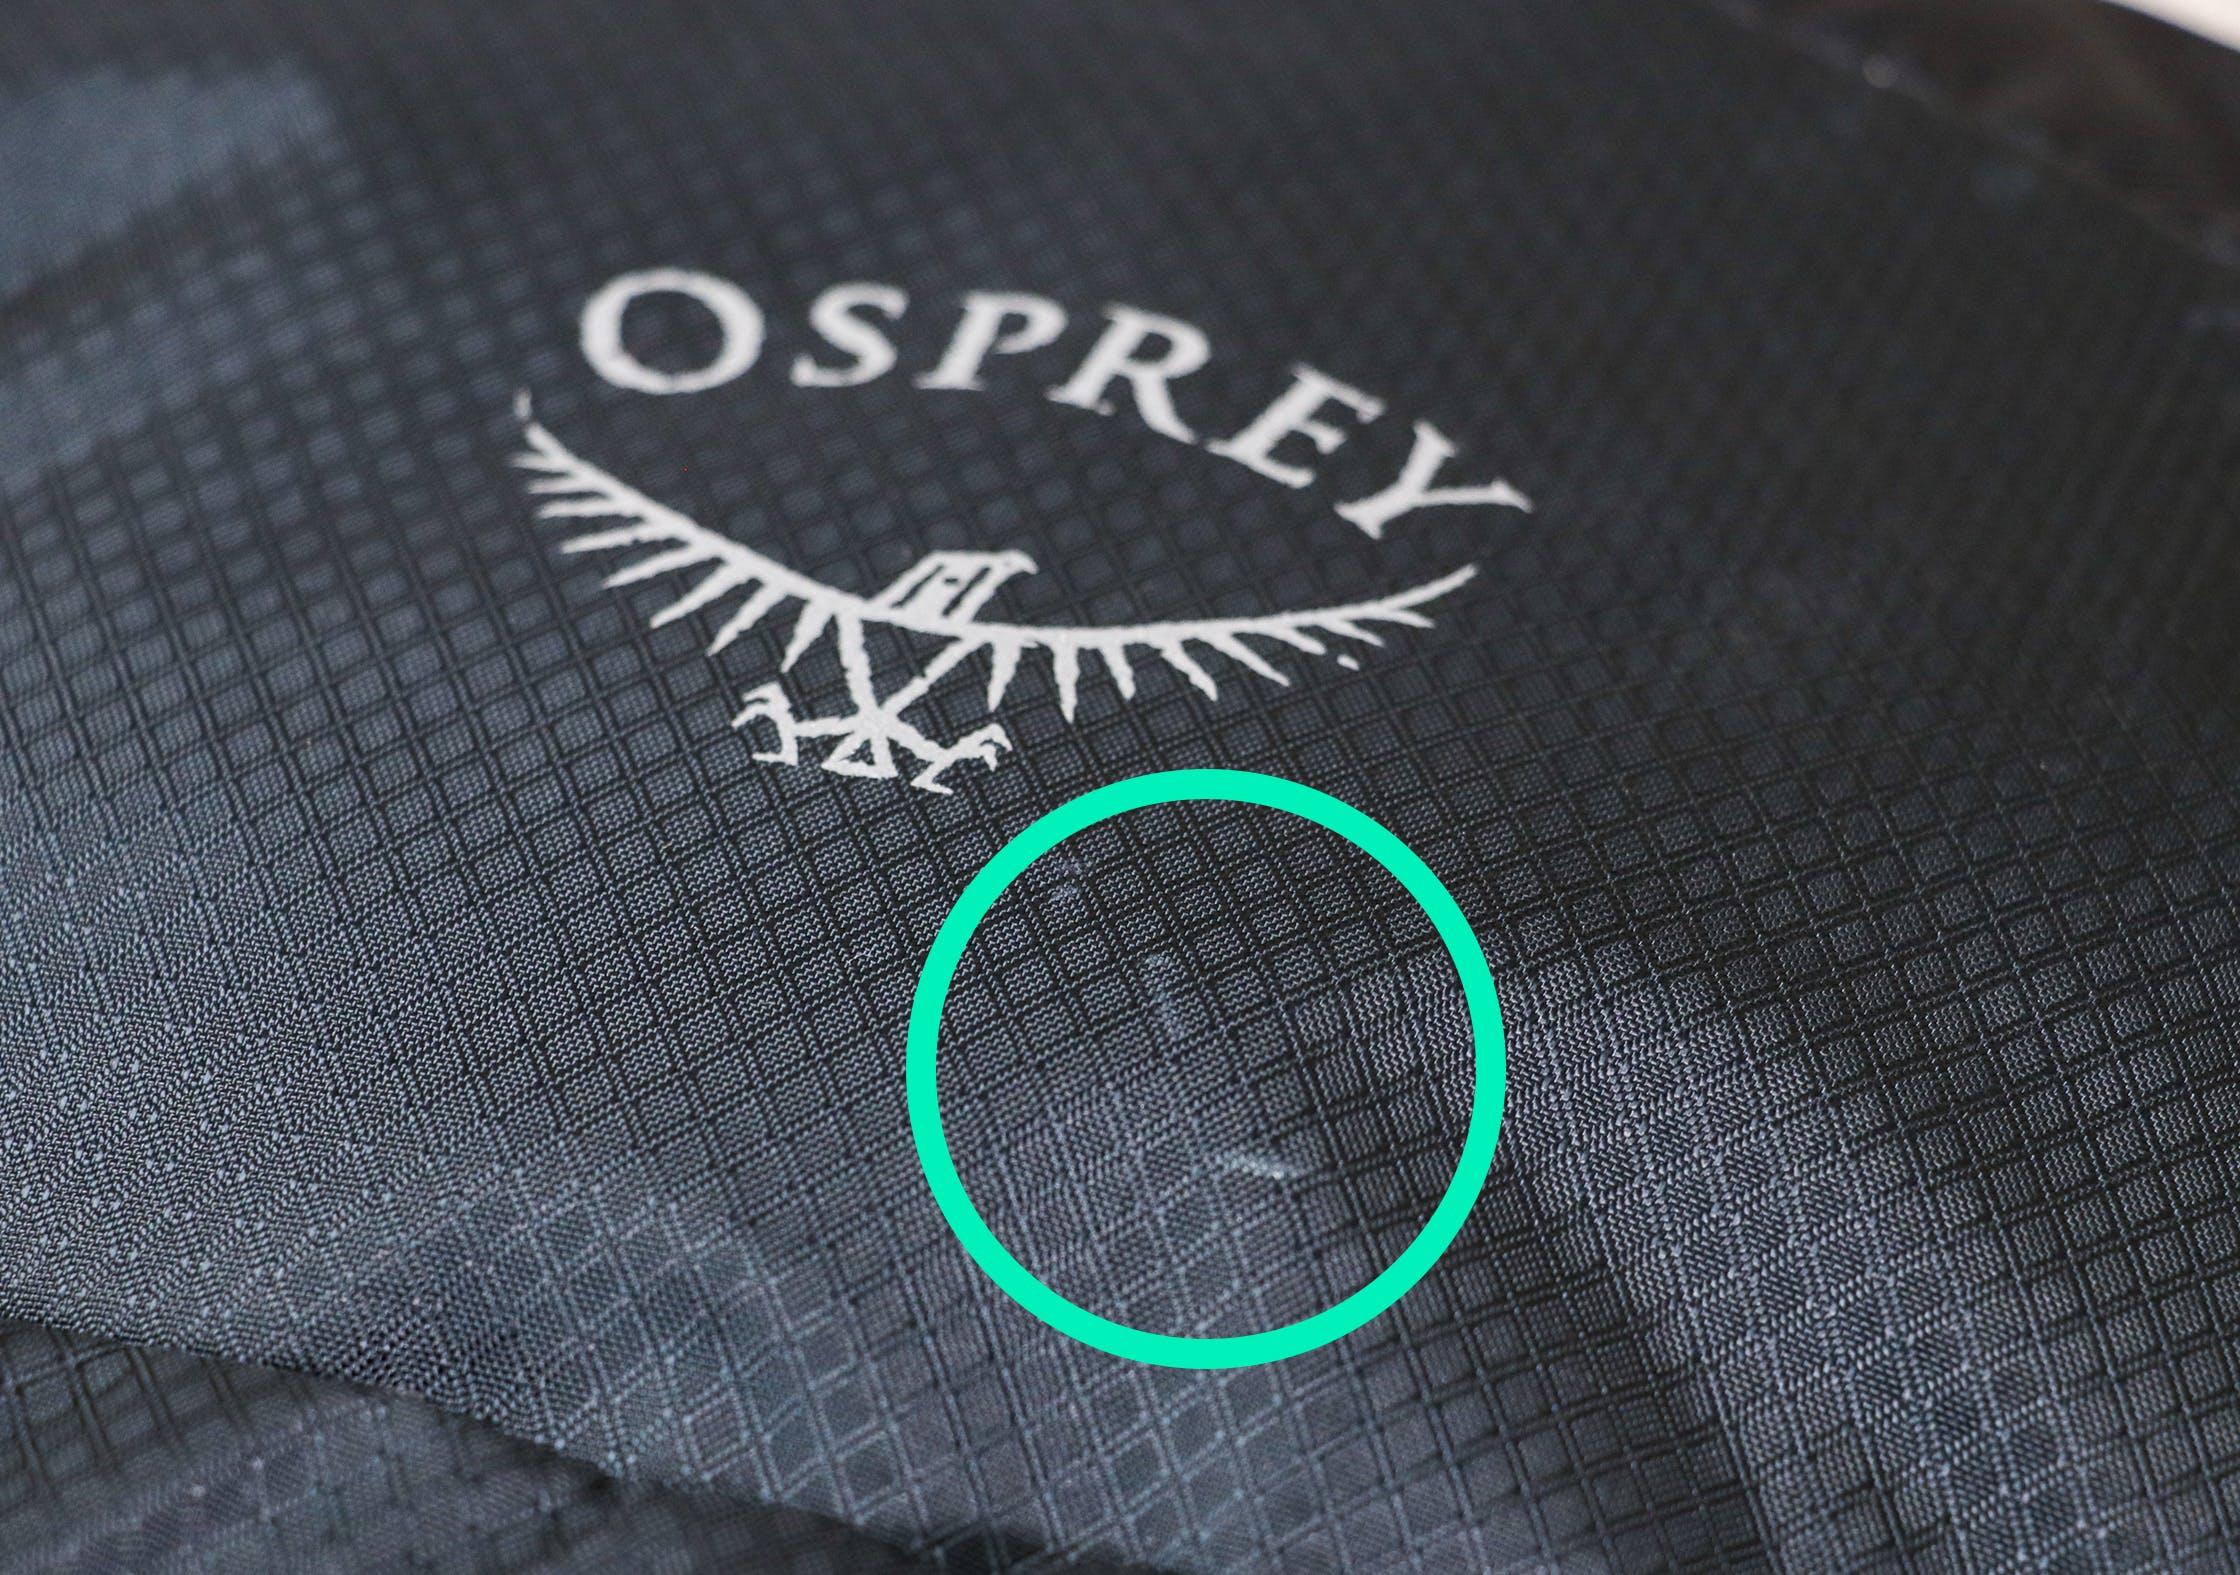 Osprey Daylite Plus Abrasion Marks